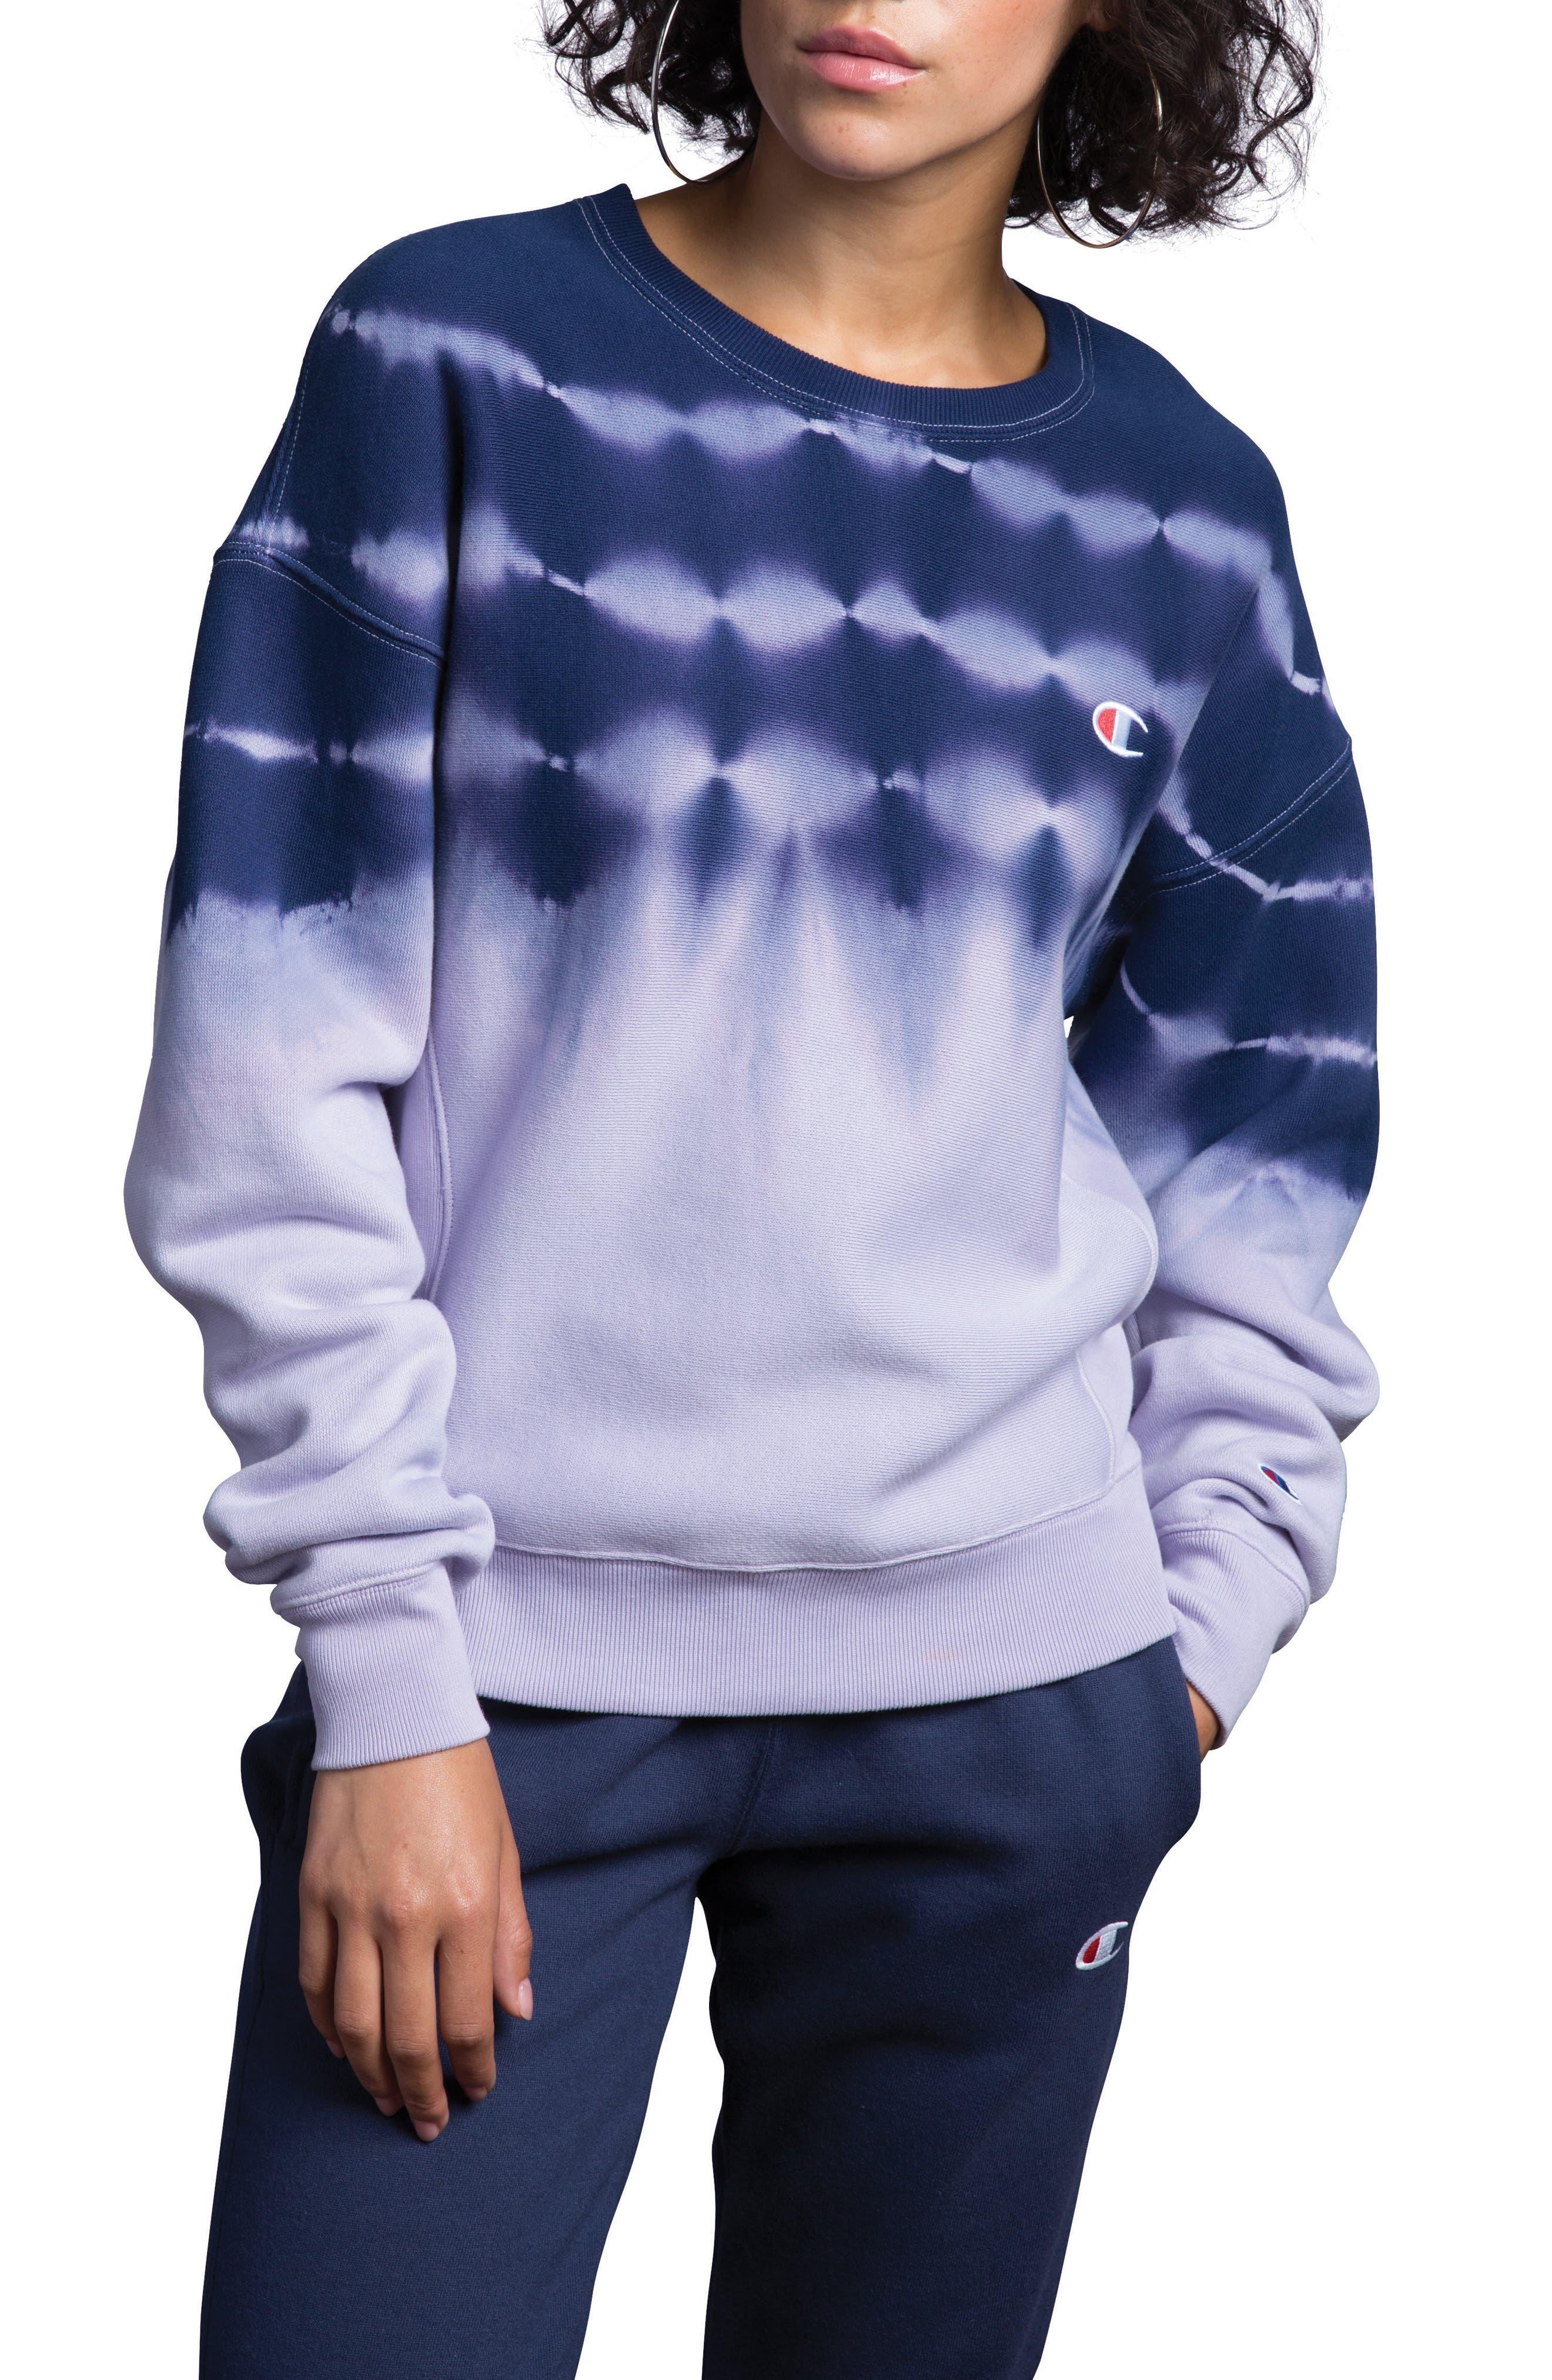 CHAMPION, Streak Dye Sweatshirt, Main thumbnail 1, color, PALE VIOLET ROSE